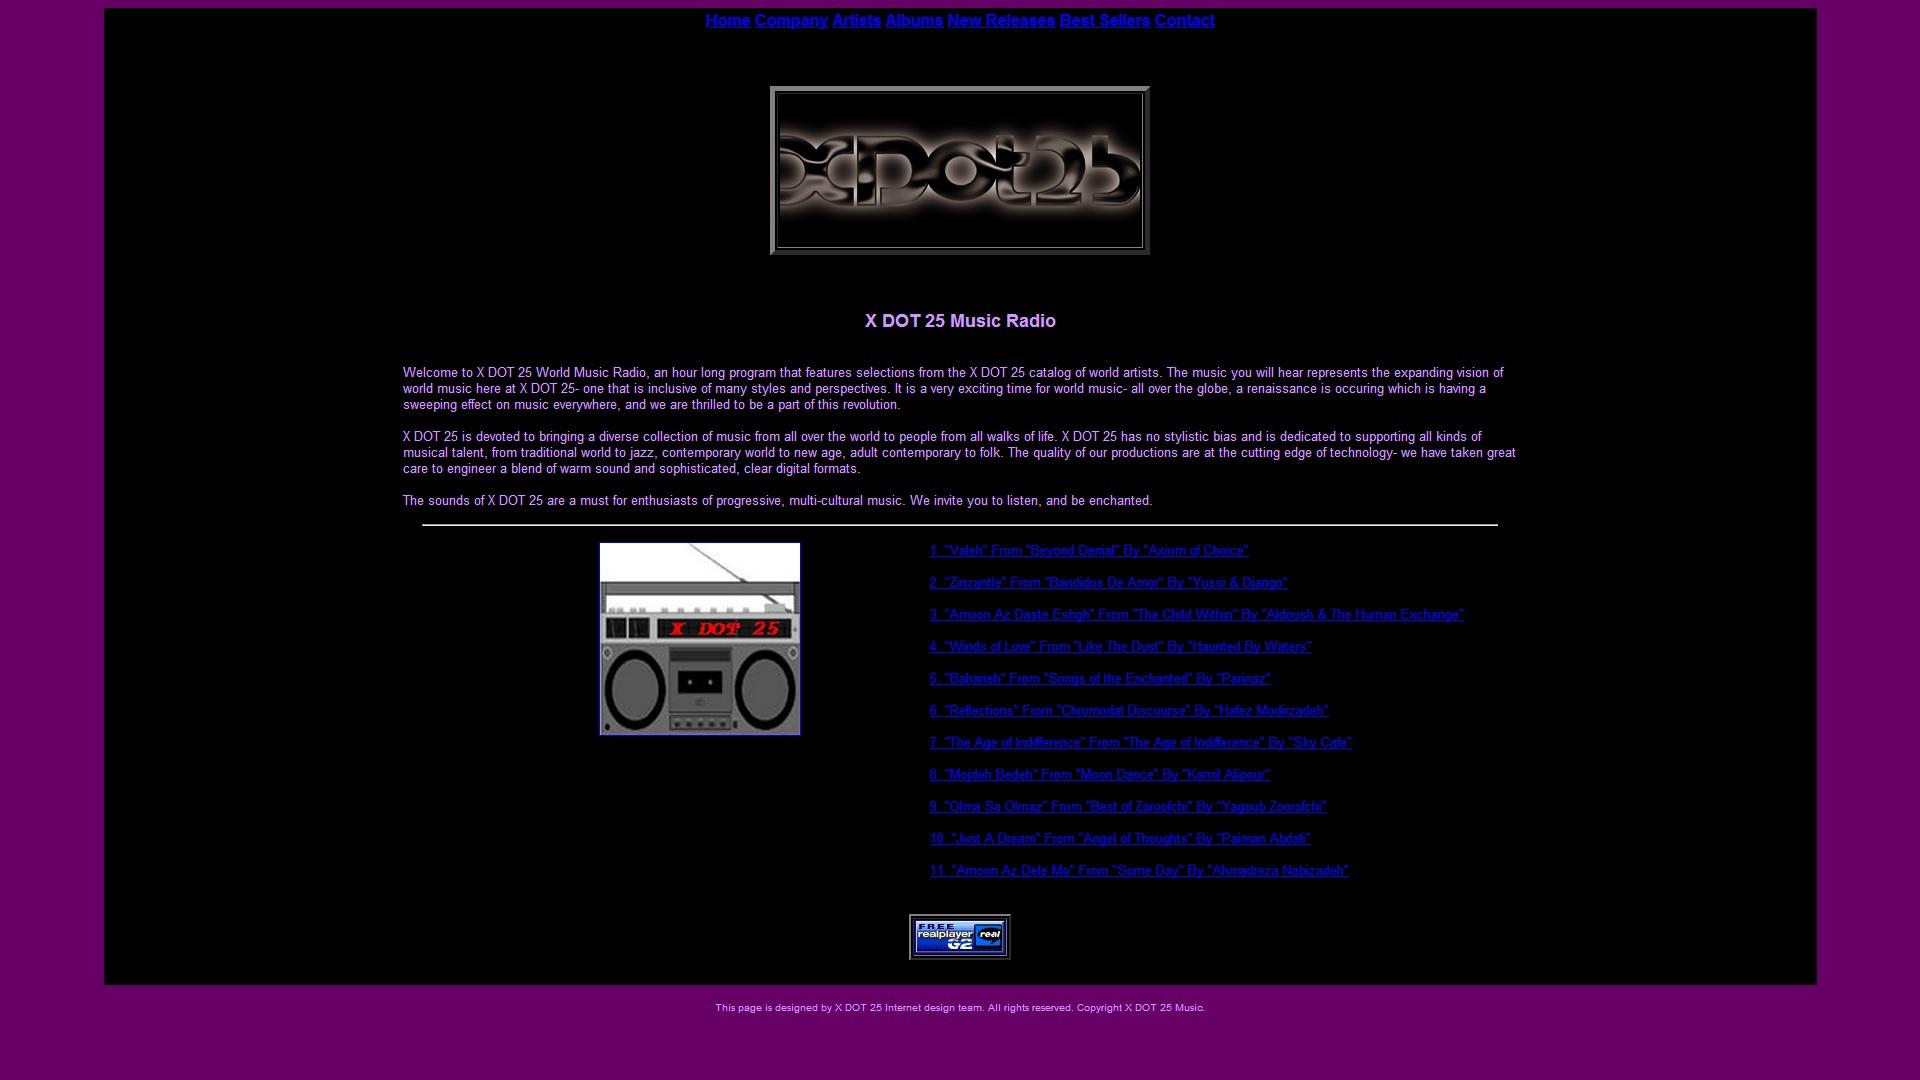 XDOT 25 Music Radio